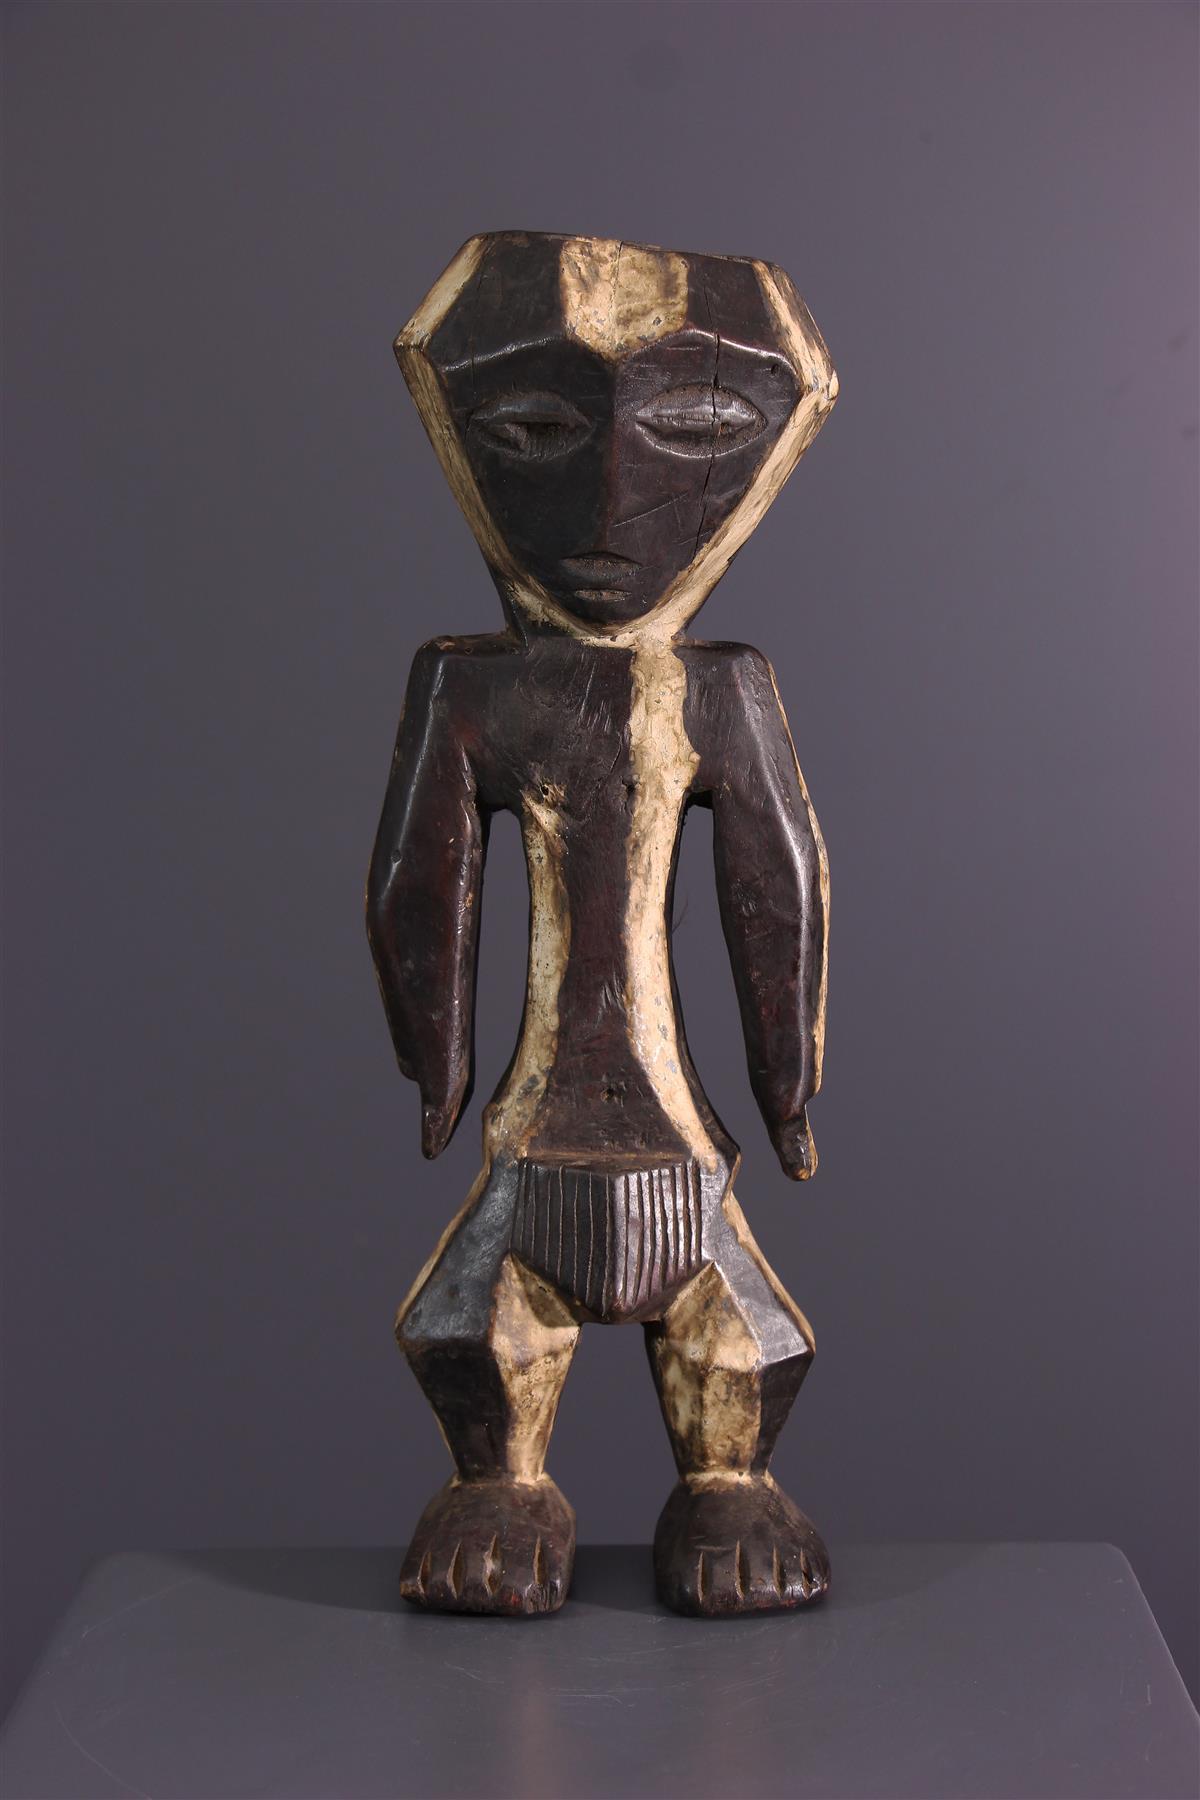 Yela Statuette - African art